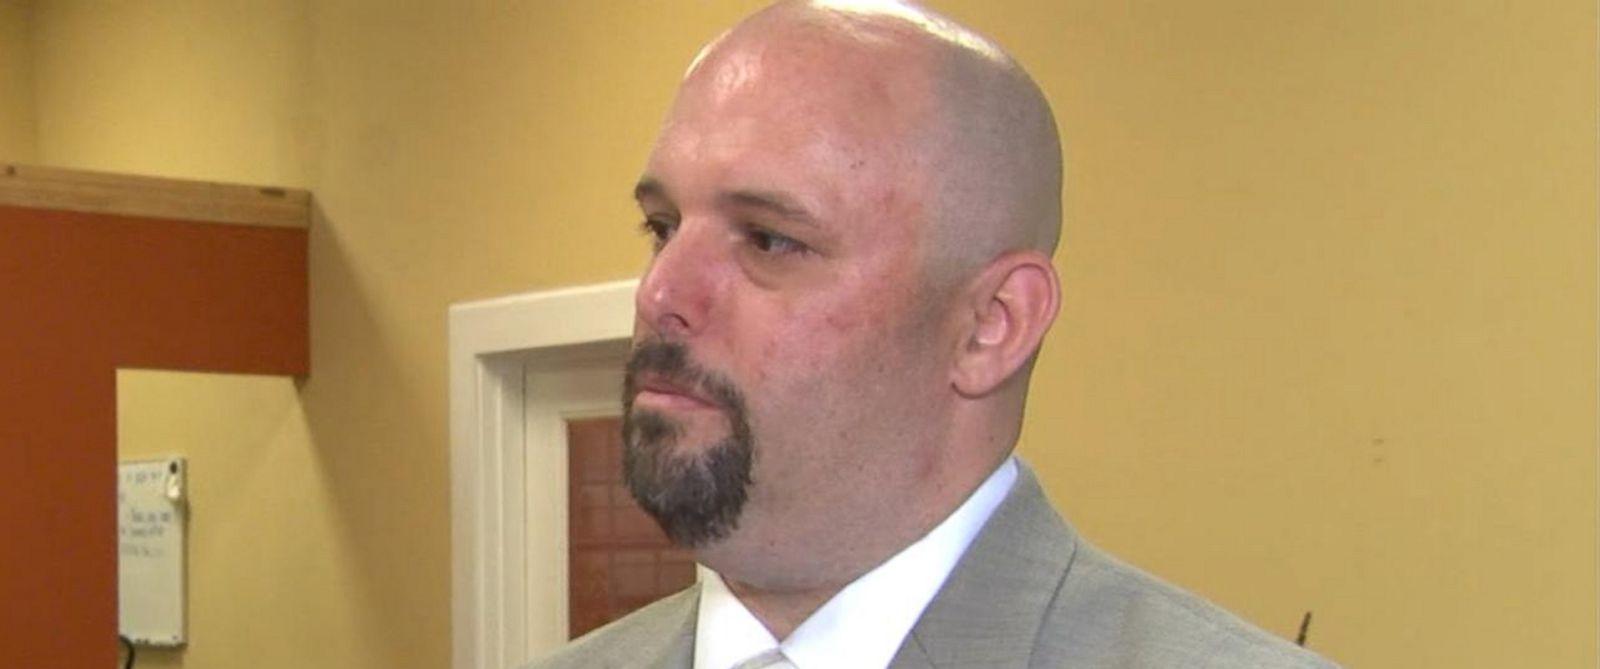 VIDEO: Lawyer for Sante Fe High School shooting suspect speaks